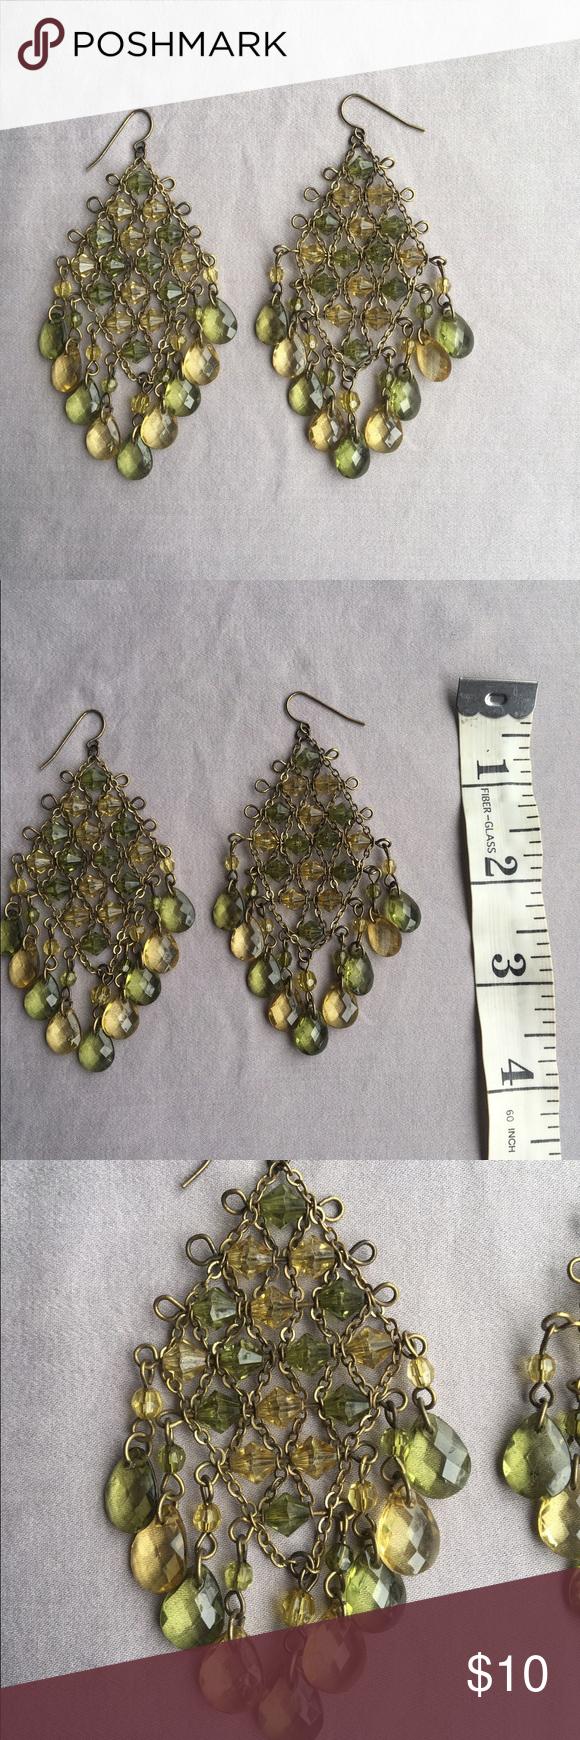 Green earrings Green and yellowish beadded earrings. Never worn Jewelry Earrings